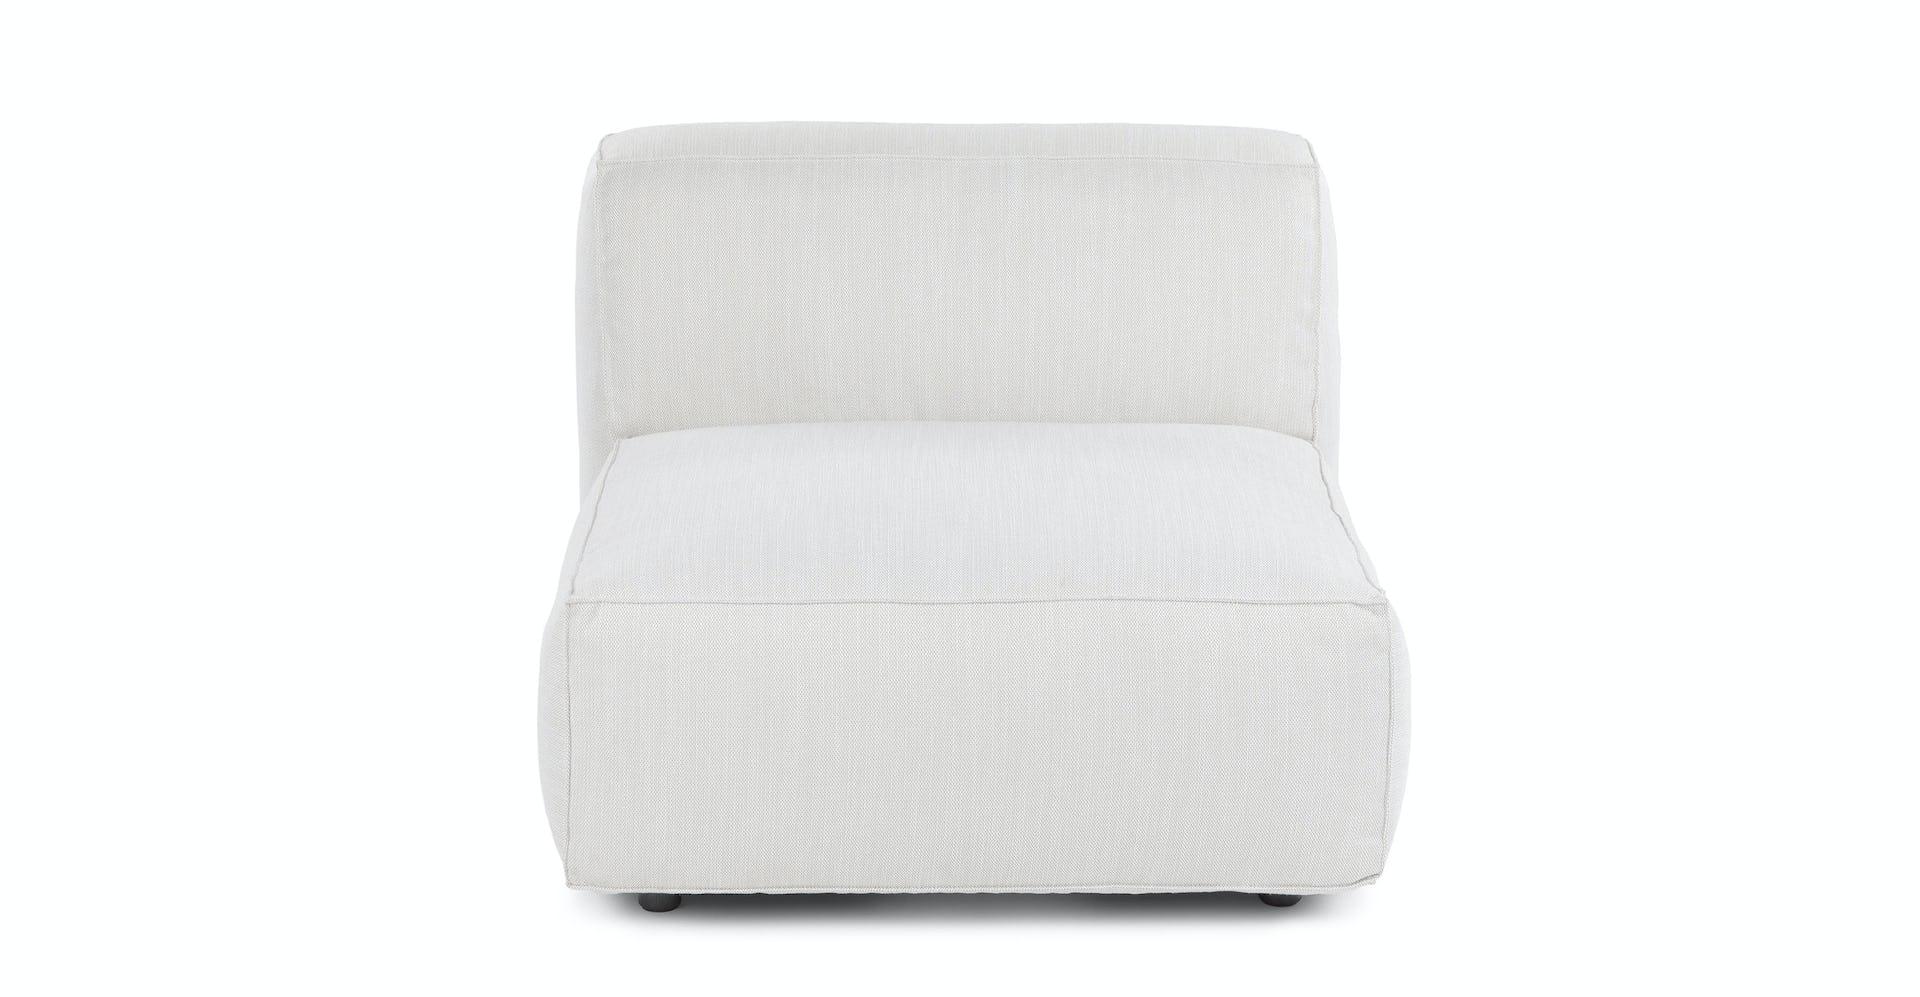 Outstanding Solae Chill White Armless Chair Module Spiritservingveterans Wood Chair Design Ideas Spiritservingveteransorg